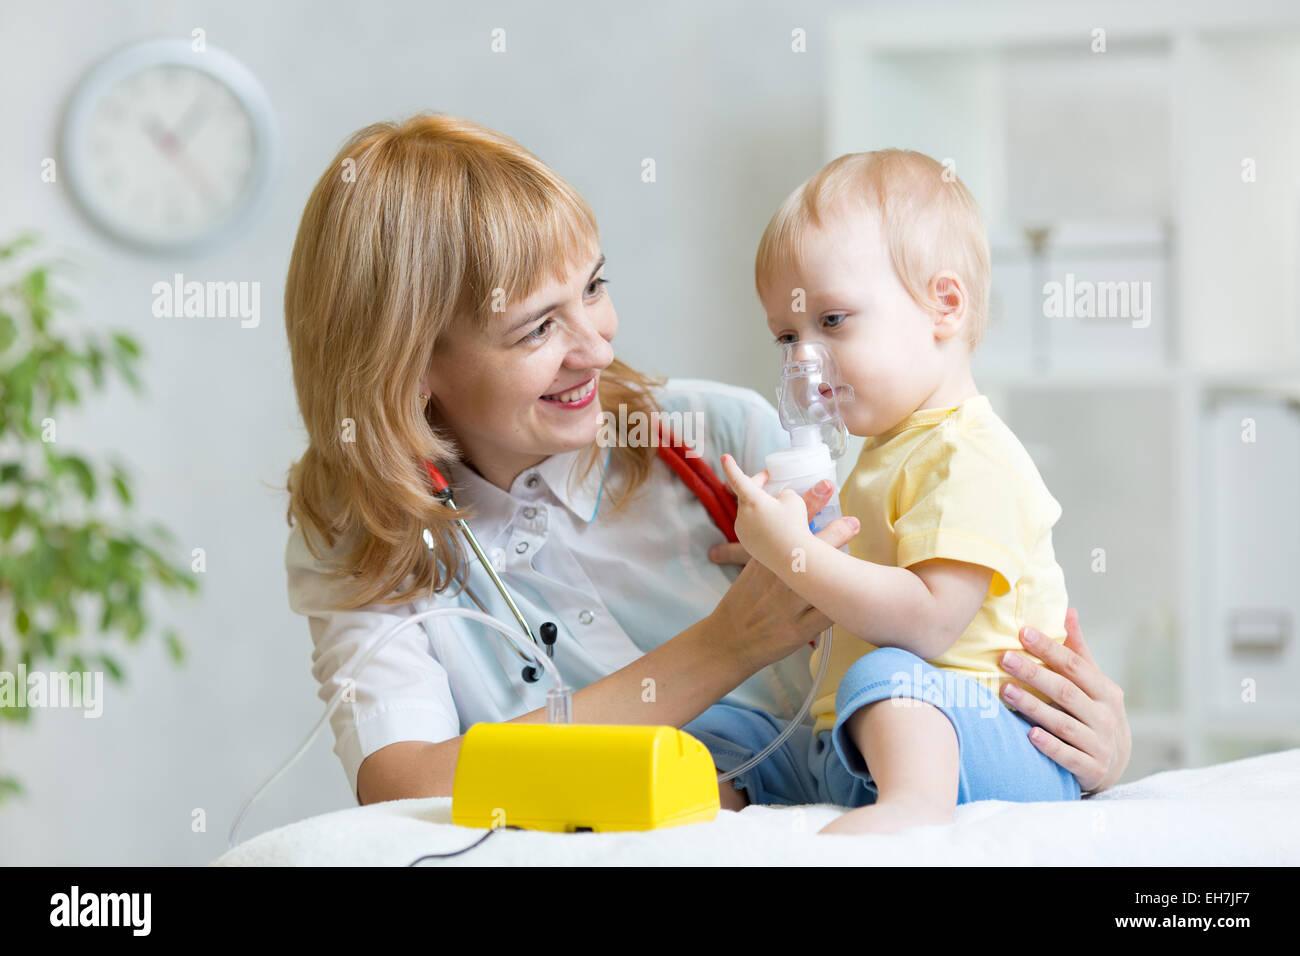 Doctor holding inhaler mask for kid breathing - Stock Image